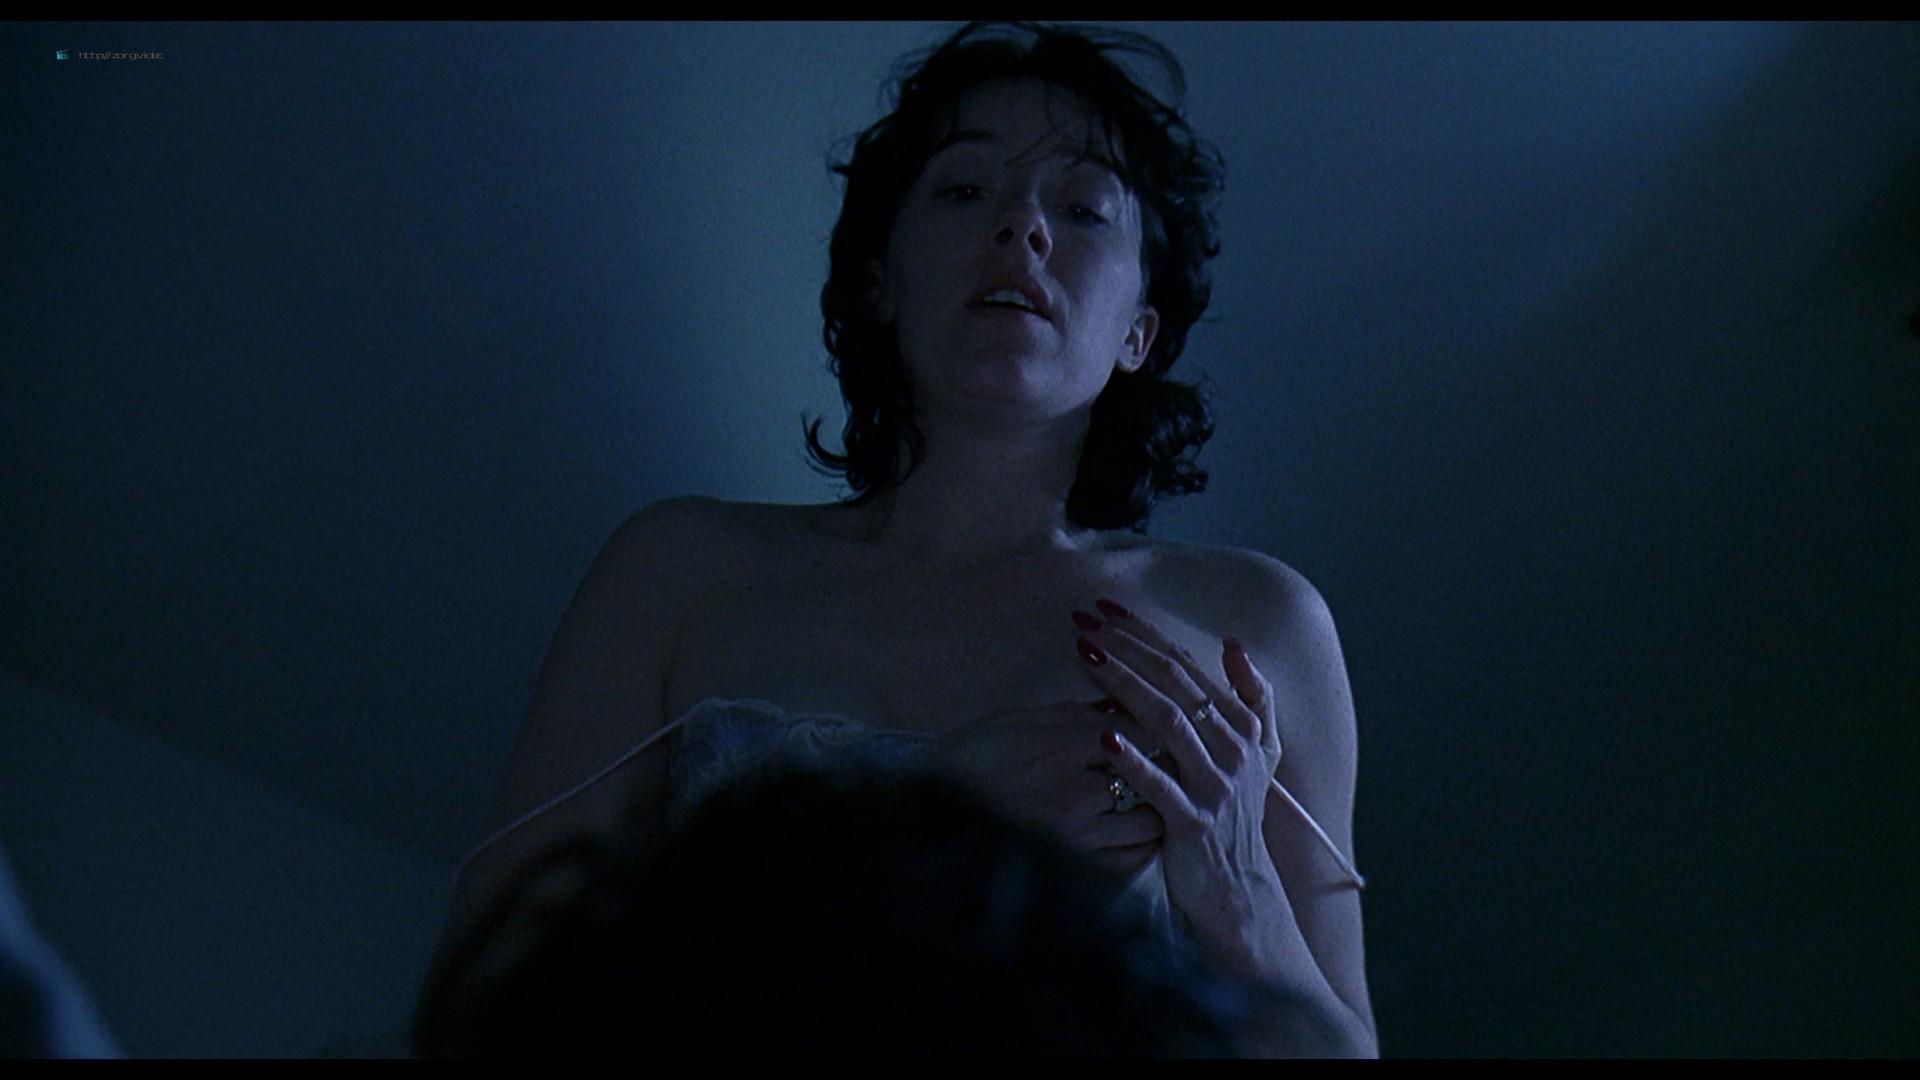 Jennifer Connelly nude side boob sex in – Waking the Dead (2000) HD 1080p BluRay (11)